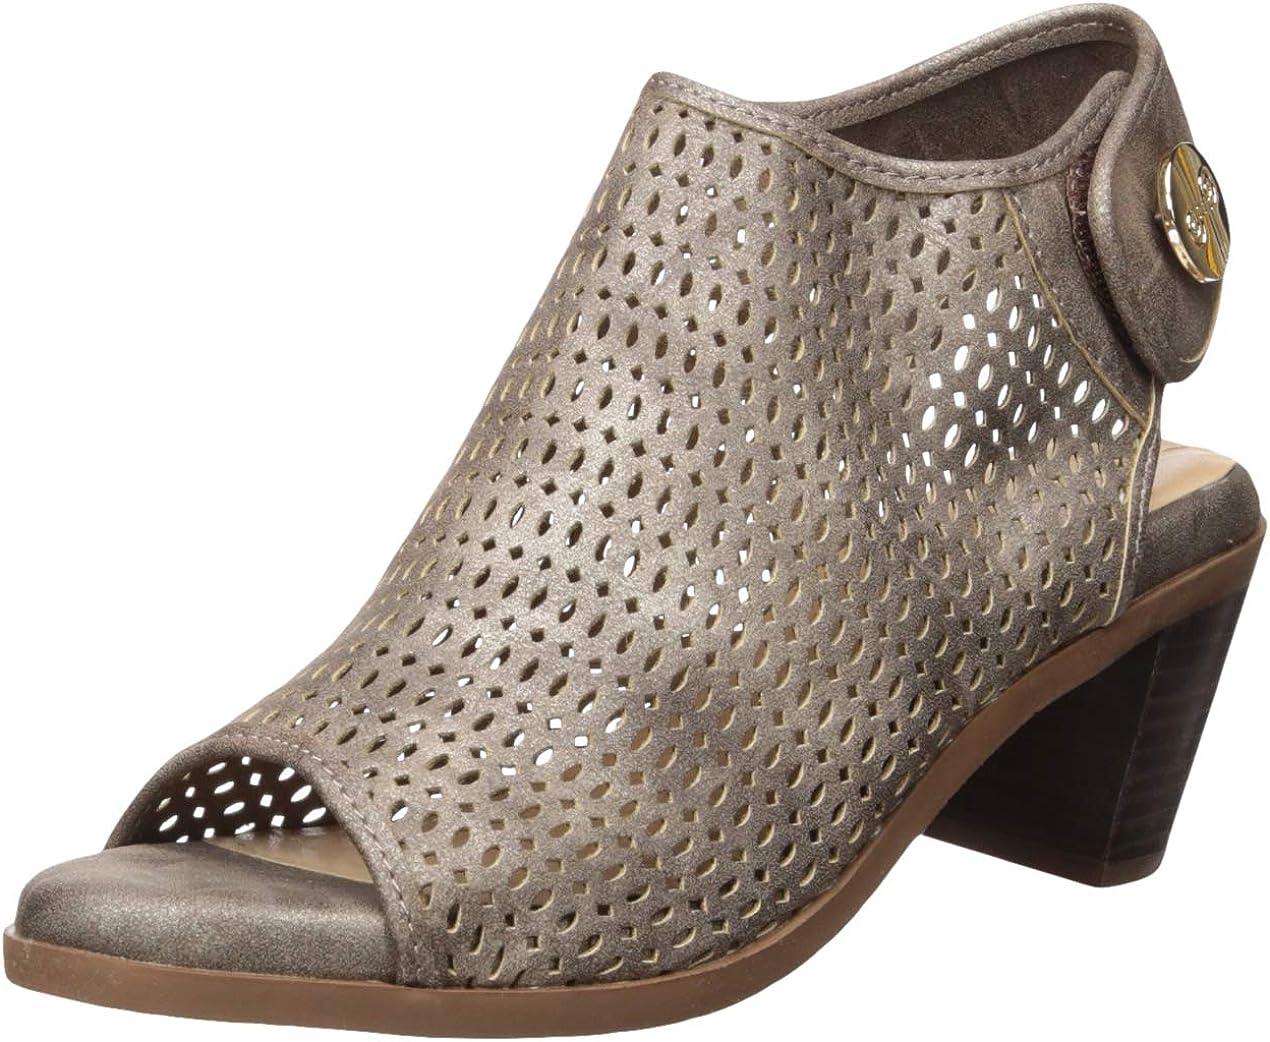 LINDSAY Over item handling ☆ PHILLIPS Women's Sandal Heeled Special sale item Brooklyn